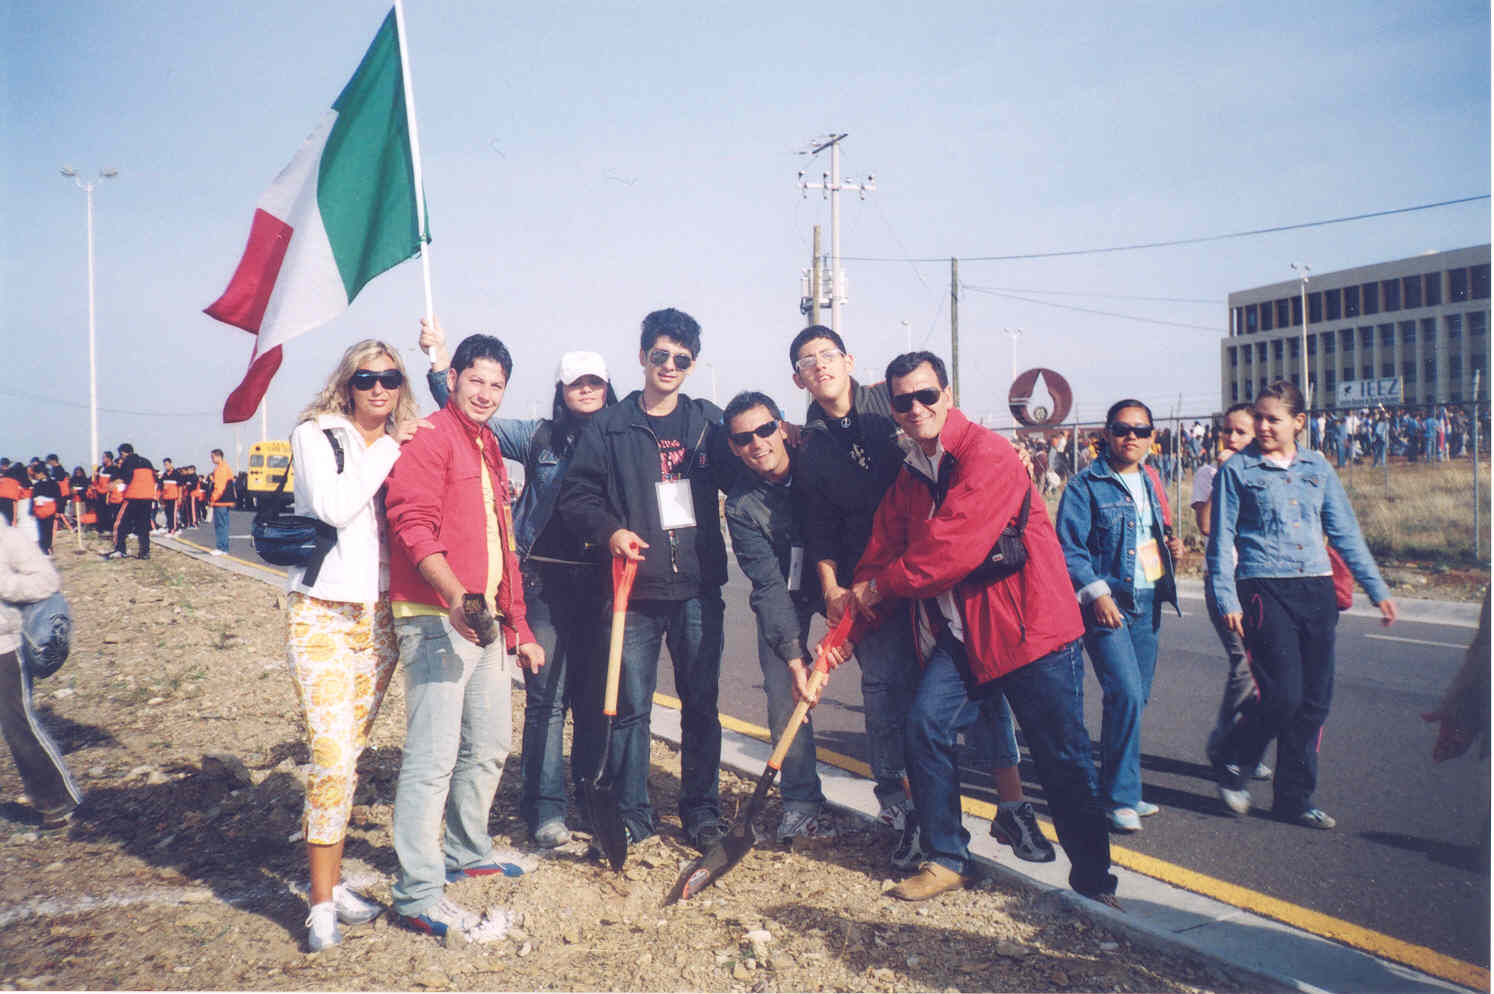 Zacatecas_foto_n.1.jpg